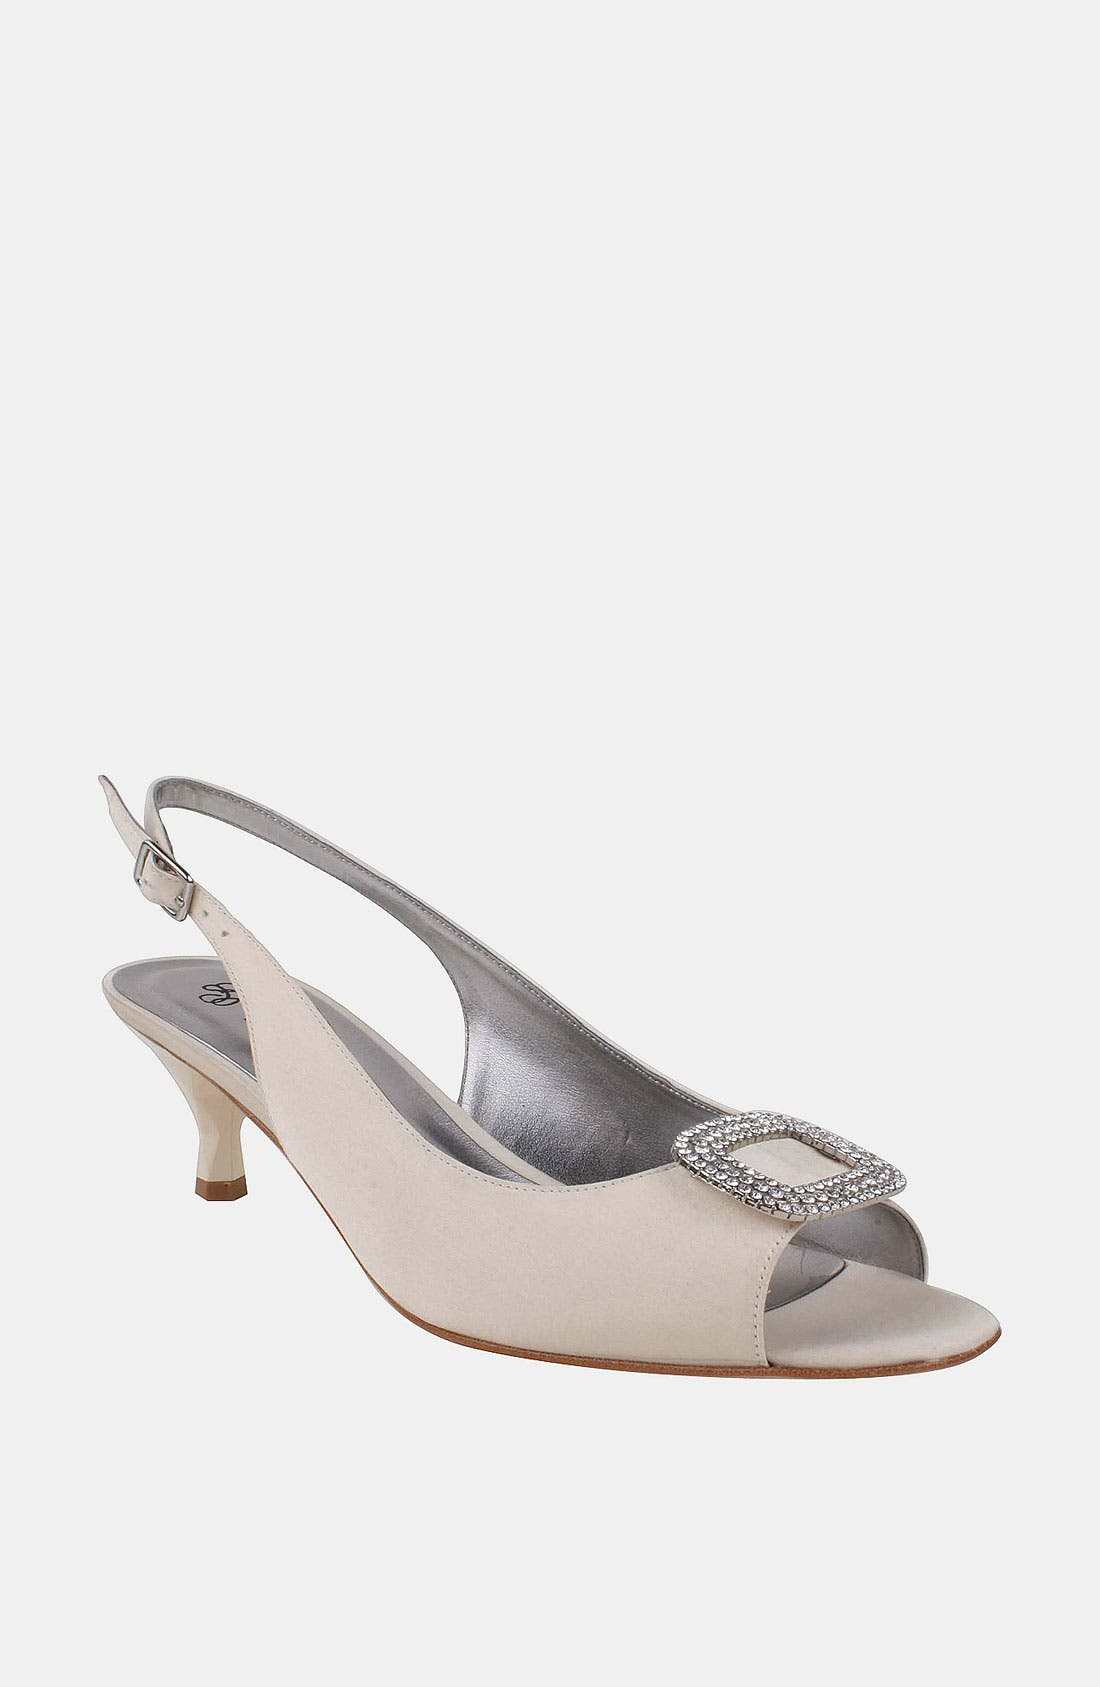 Alternate Image 1 Selected - J. Reneé 'Classic' Sandal